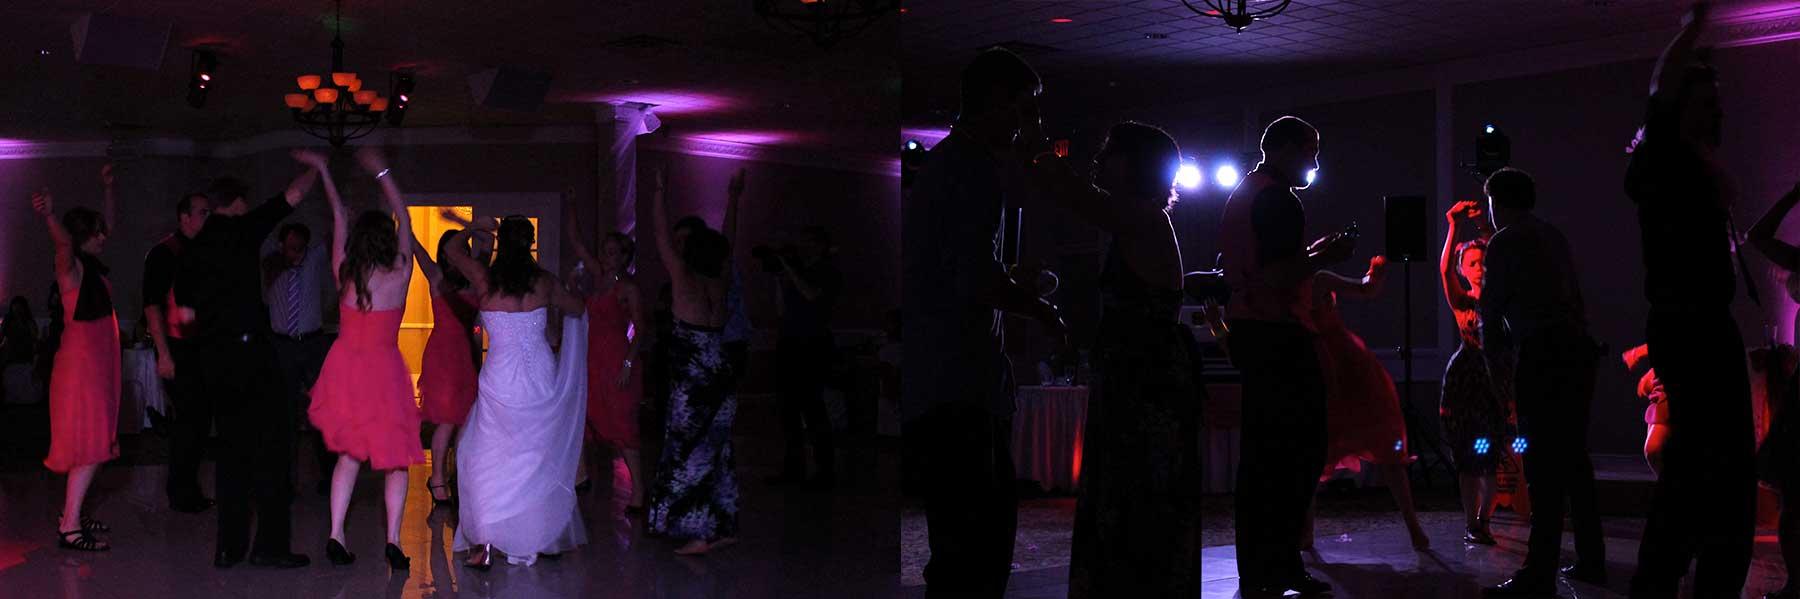 Wedding-at-Caledon-Estates-Banquet-Hall